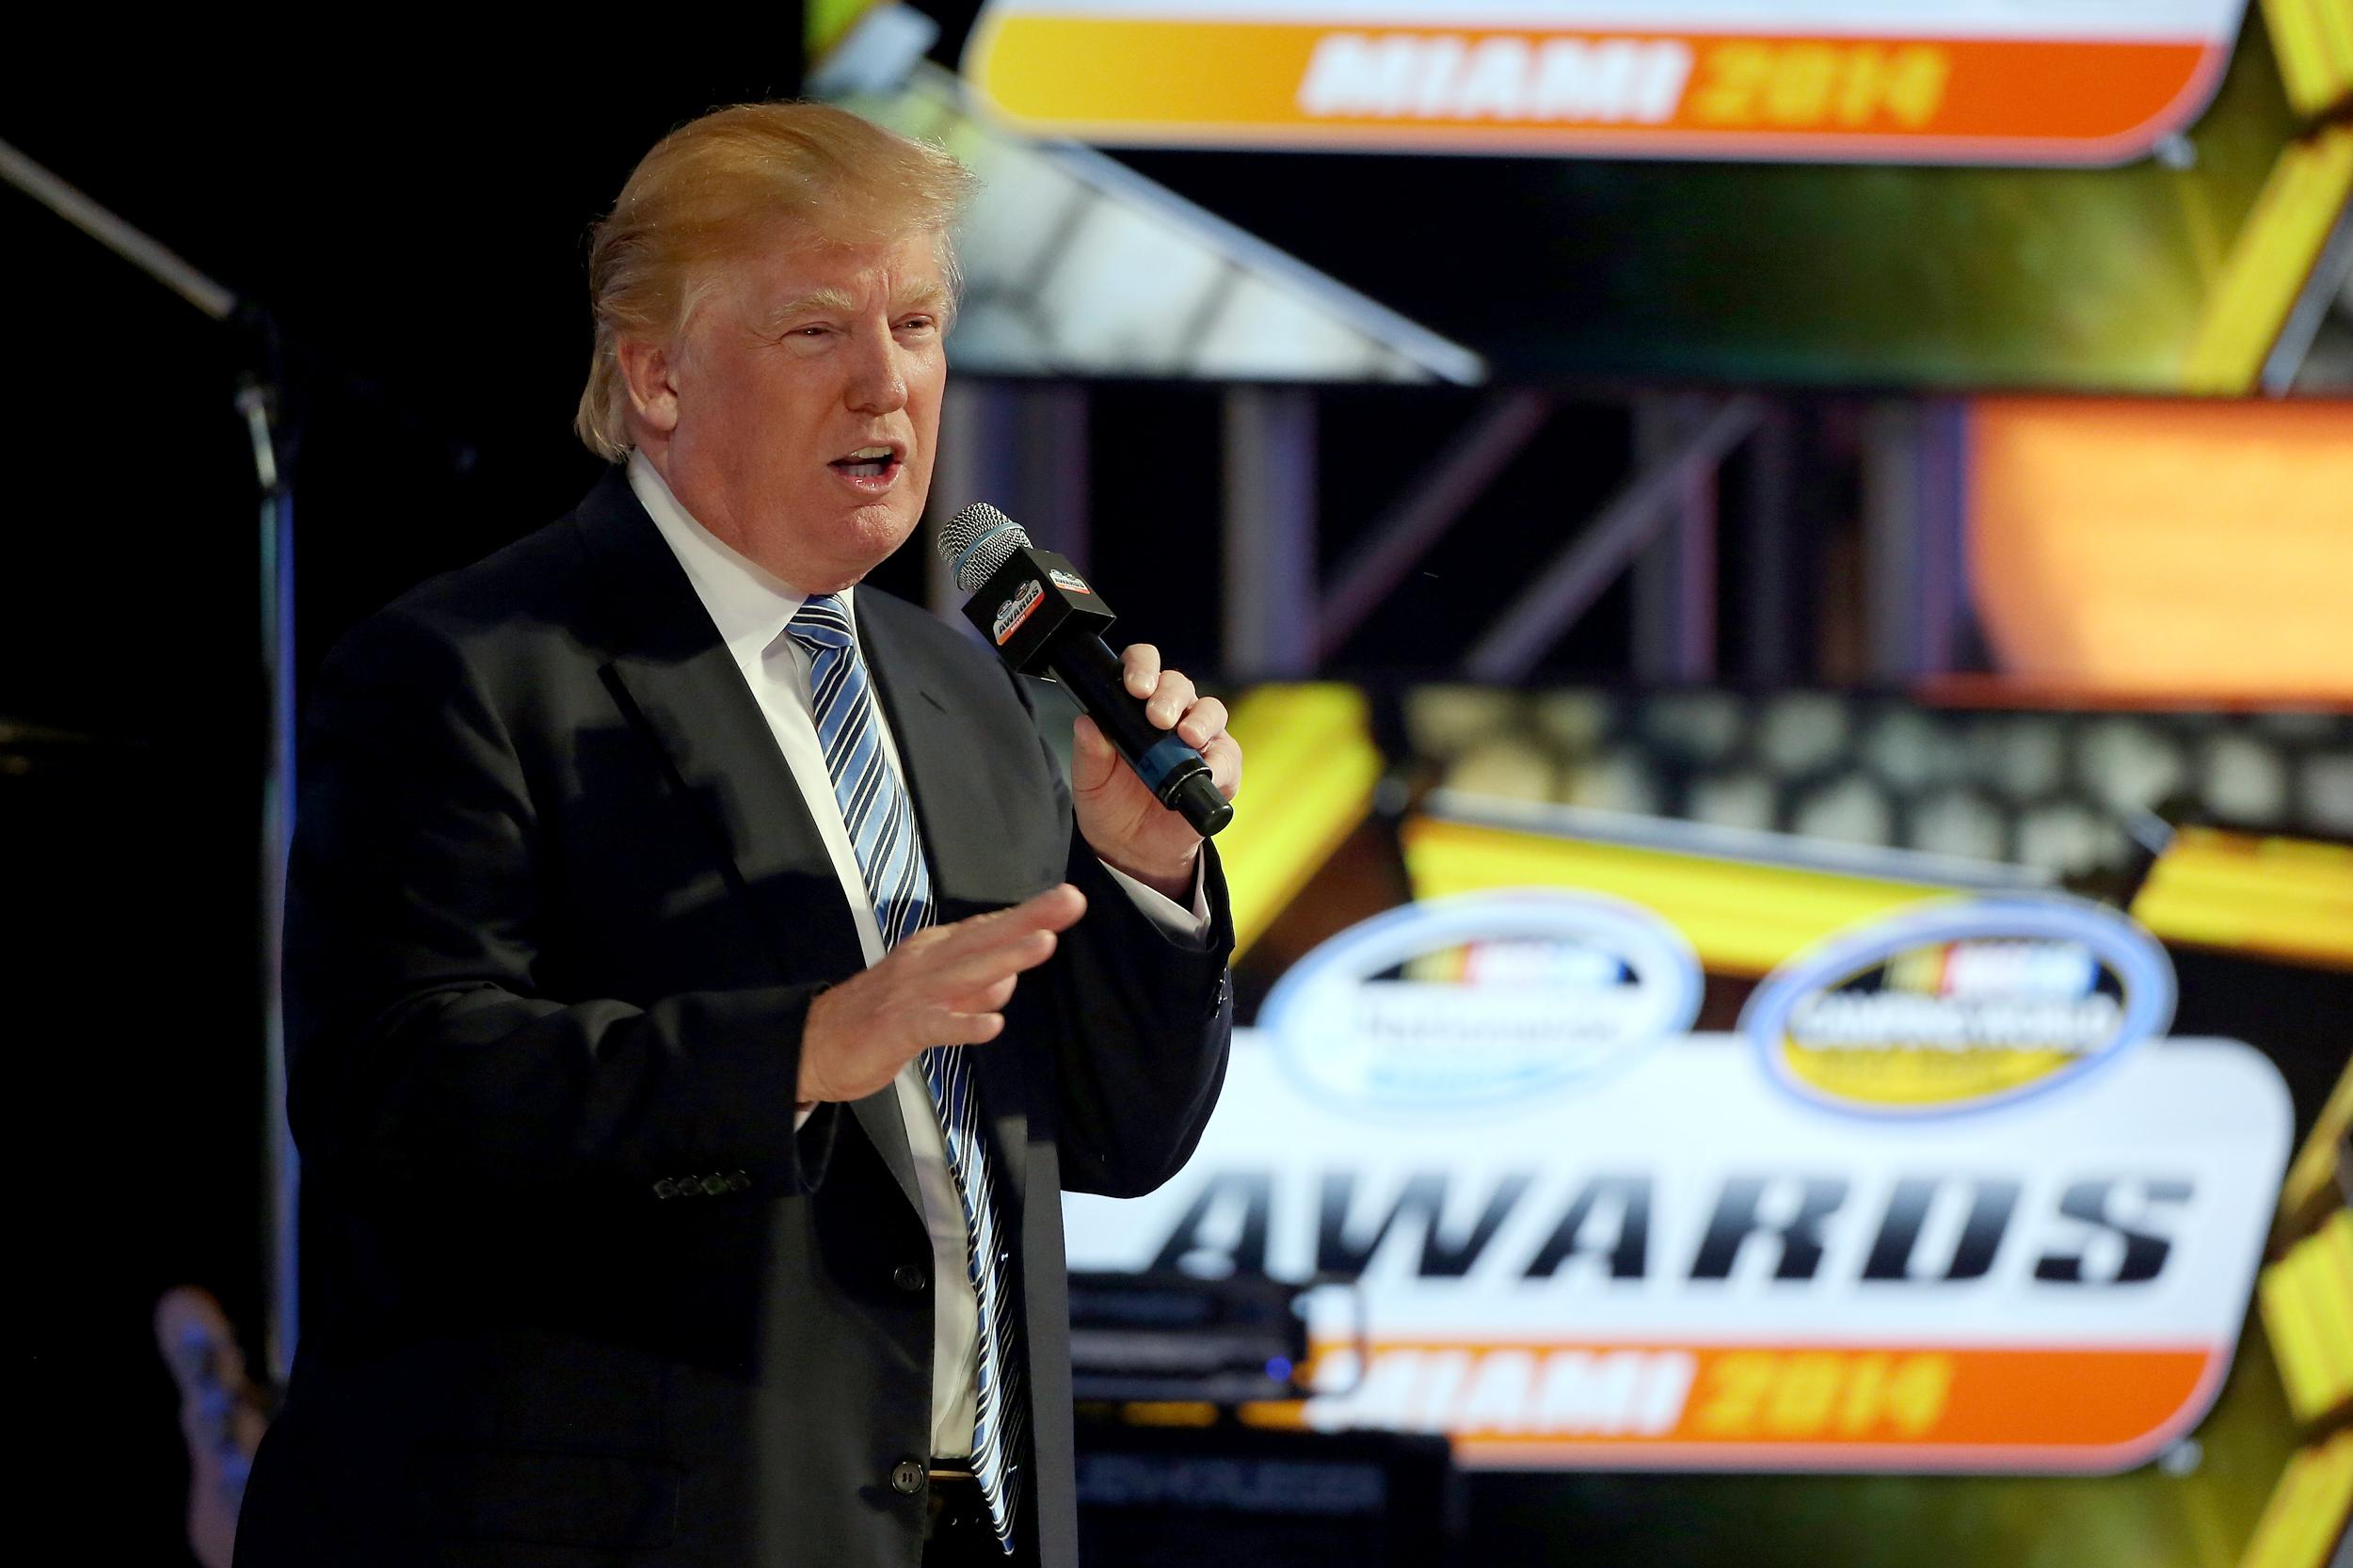 NASCAR Will Not Hold Awards Ceremony at Trump Property